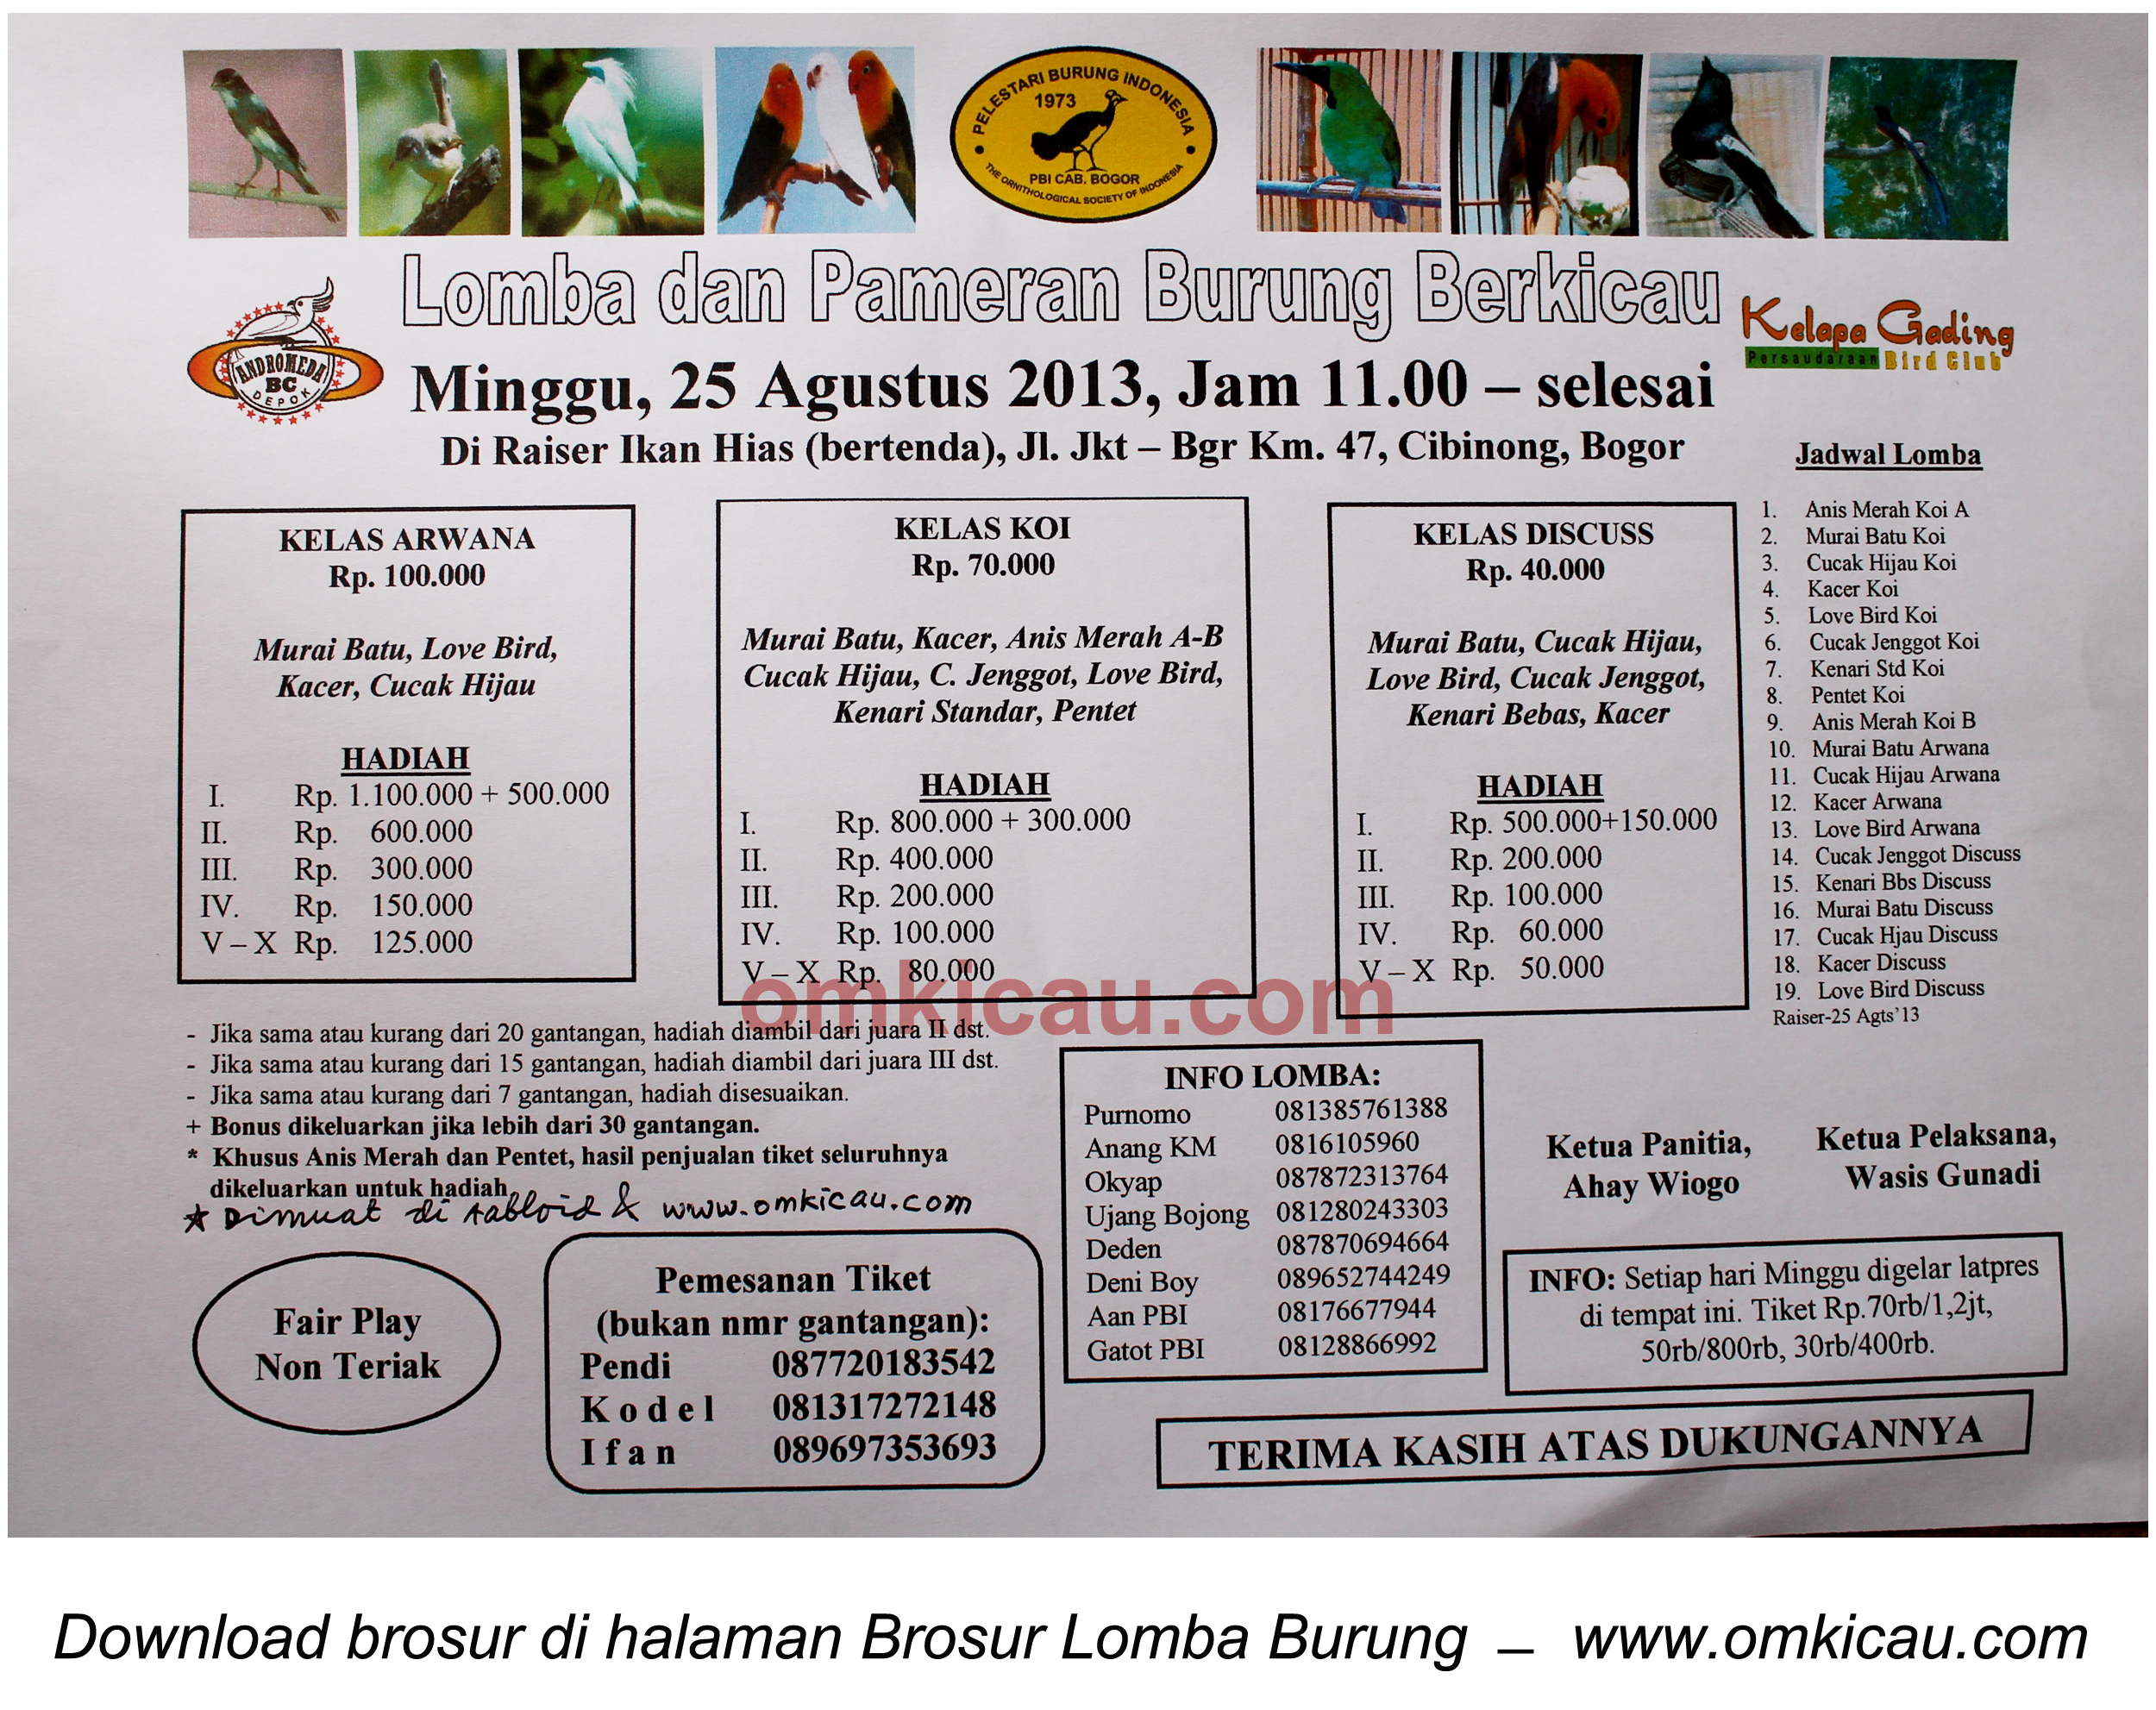 Brosur Lomba Andromeda BC 25 Agustus 2013